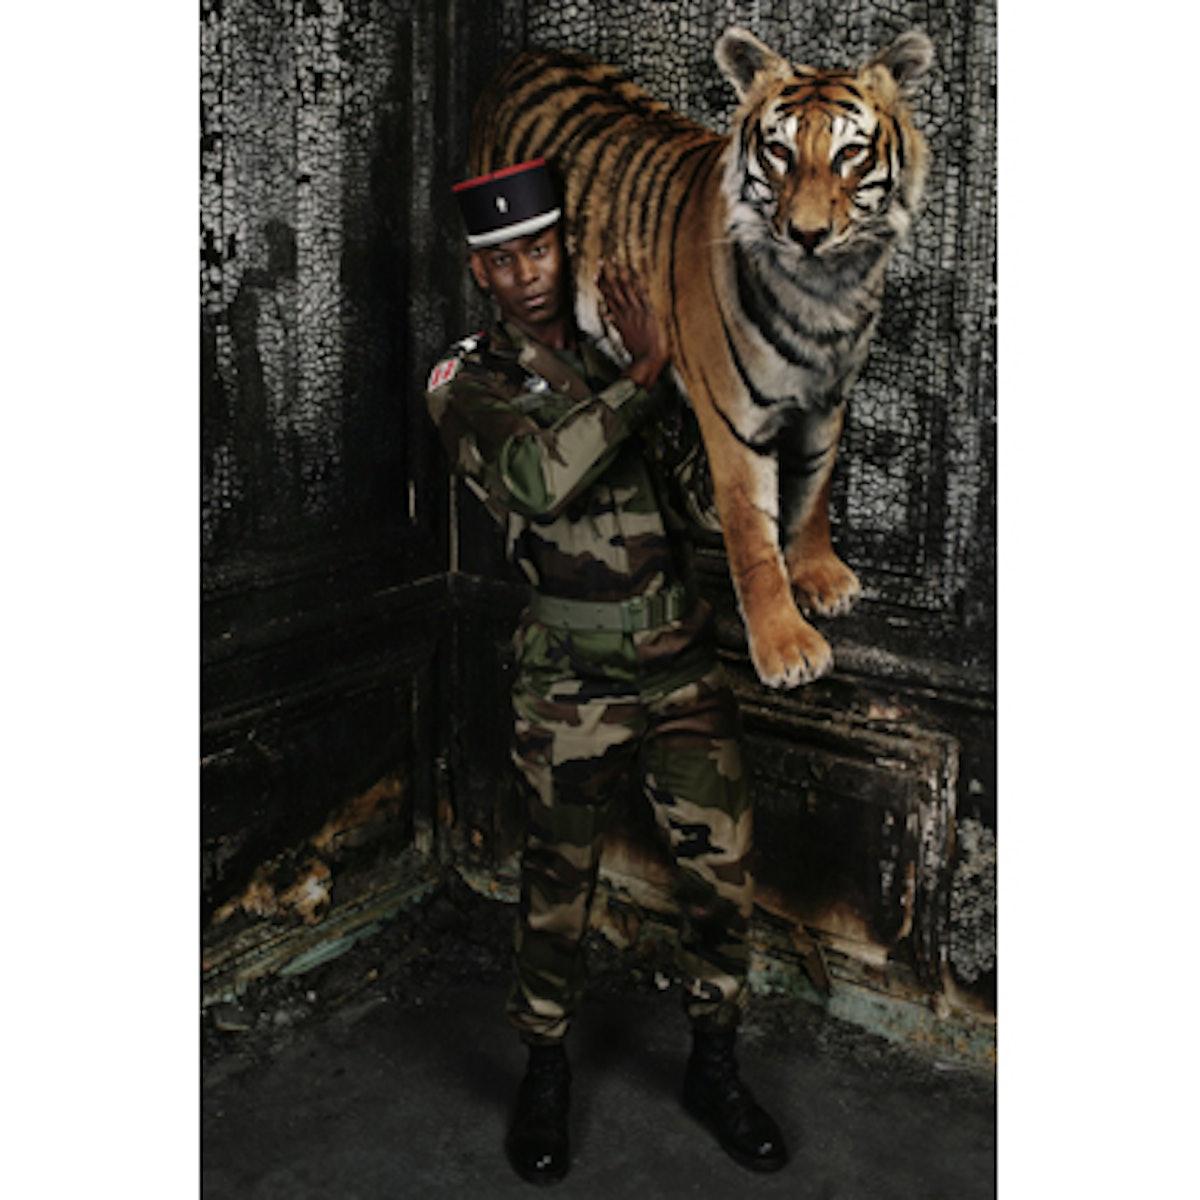 blog_deyrolles_tiger.jpg